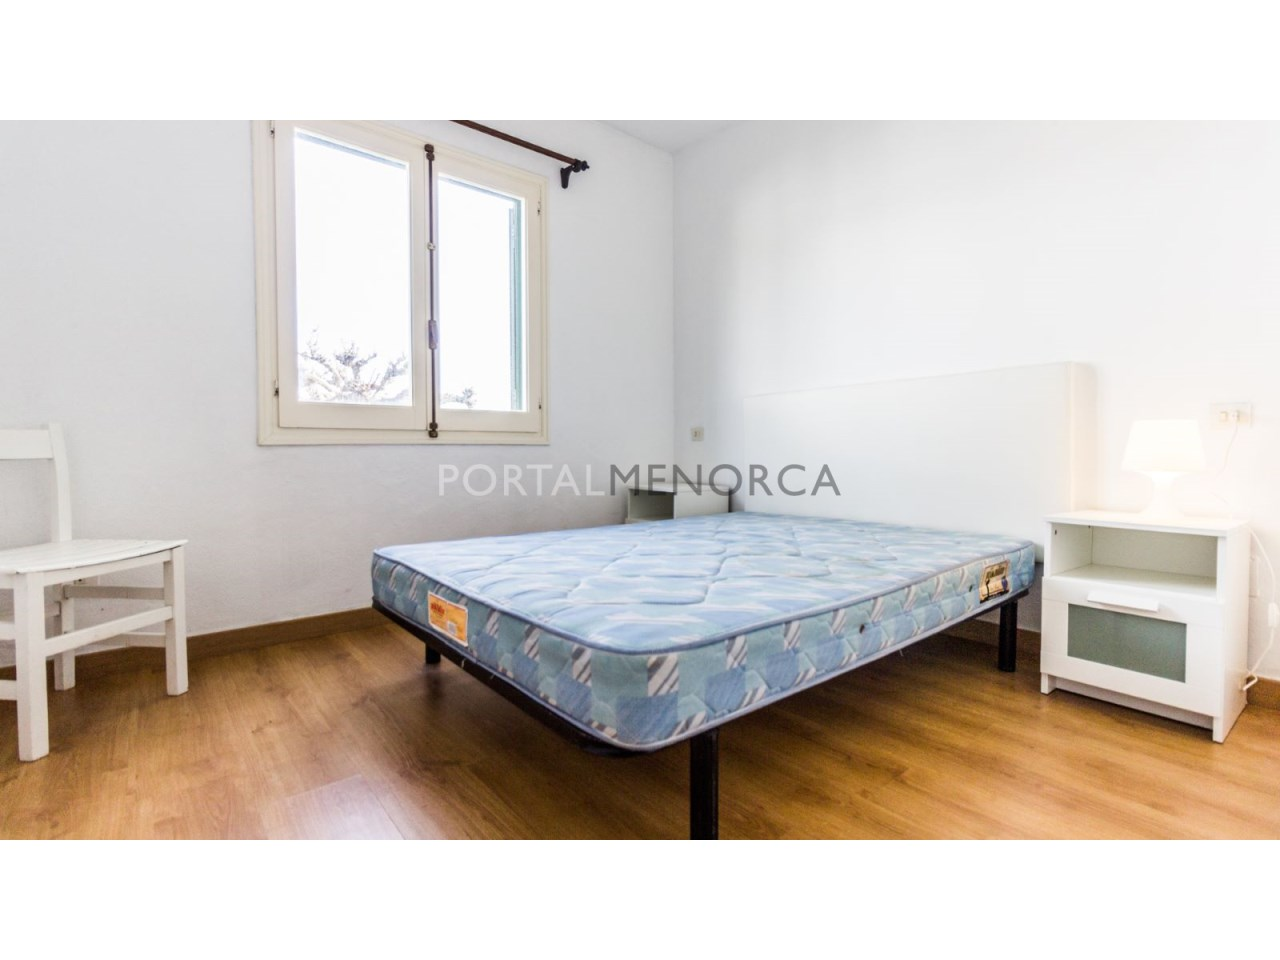 apartamento en venta en Arenal d'en Castell (7 de 11)